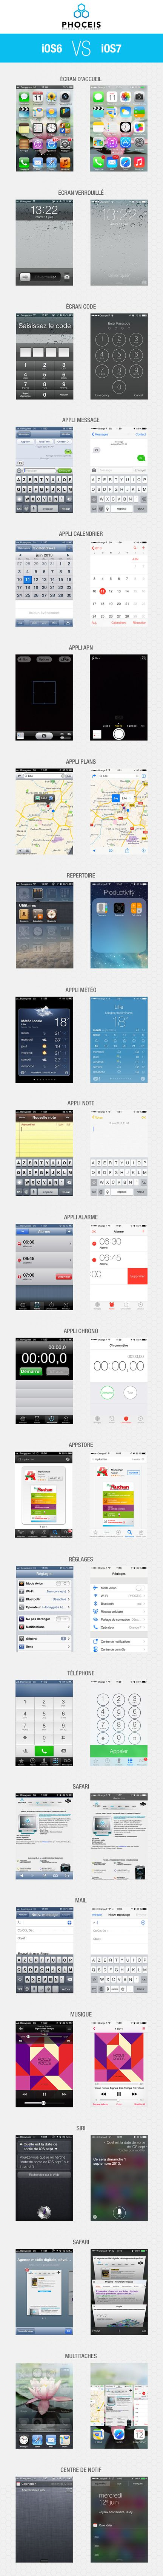 phoceis-iOS6-vs-7